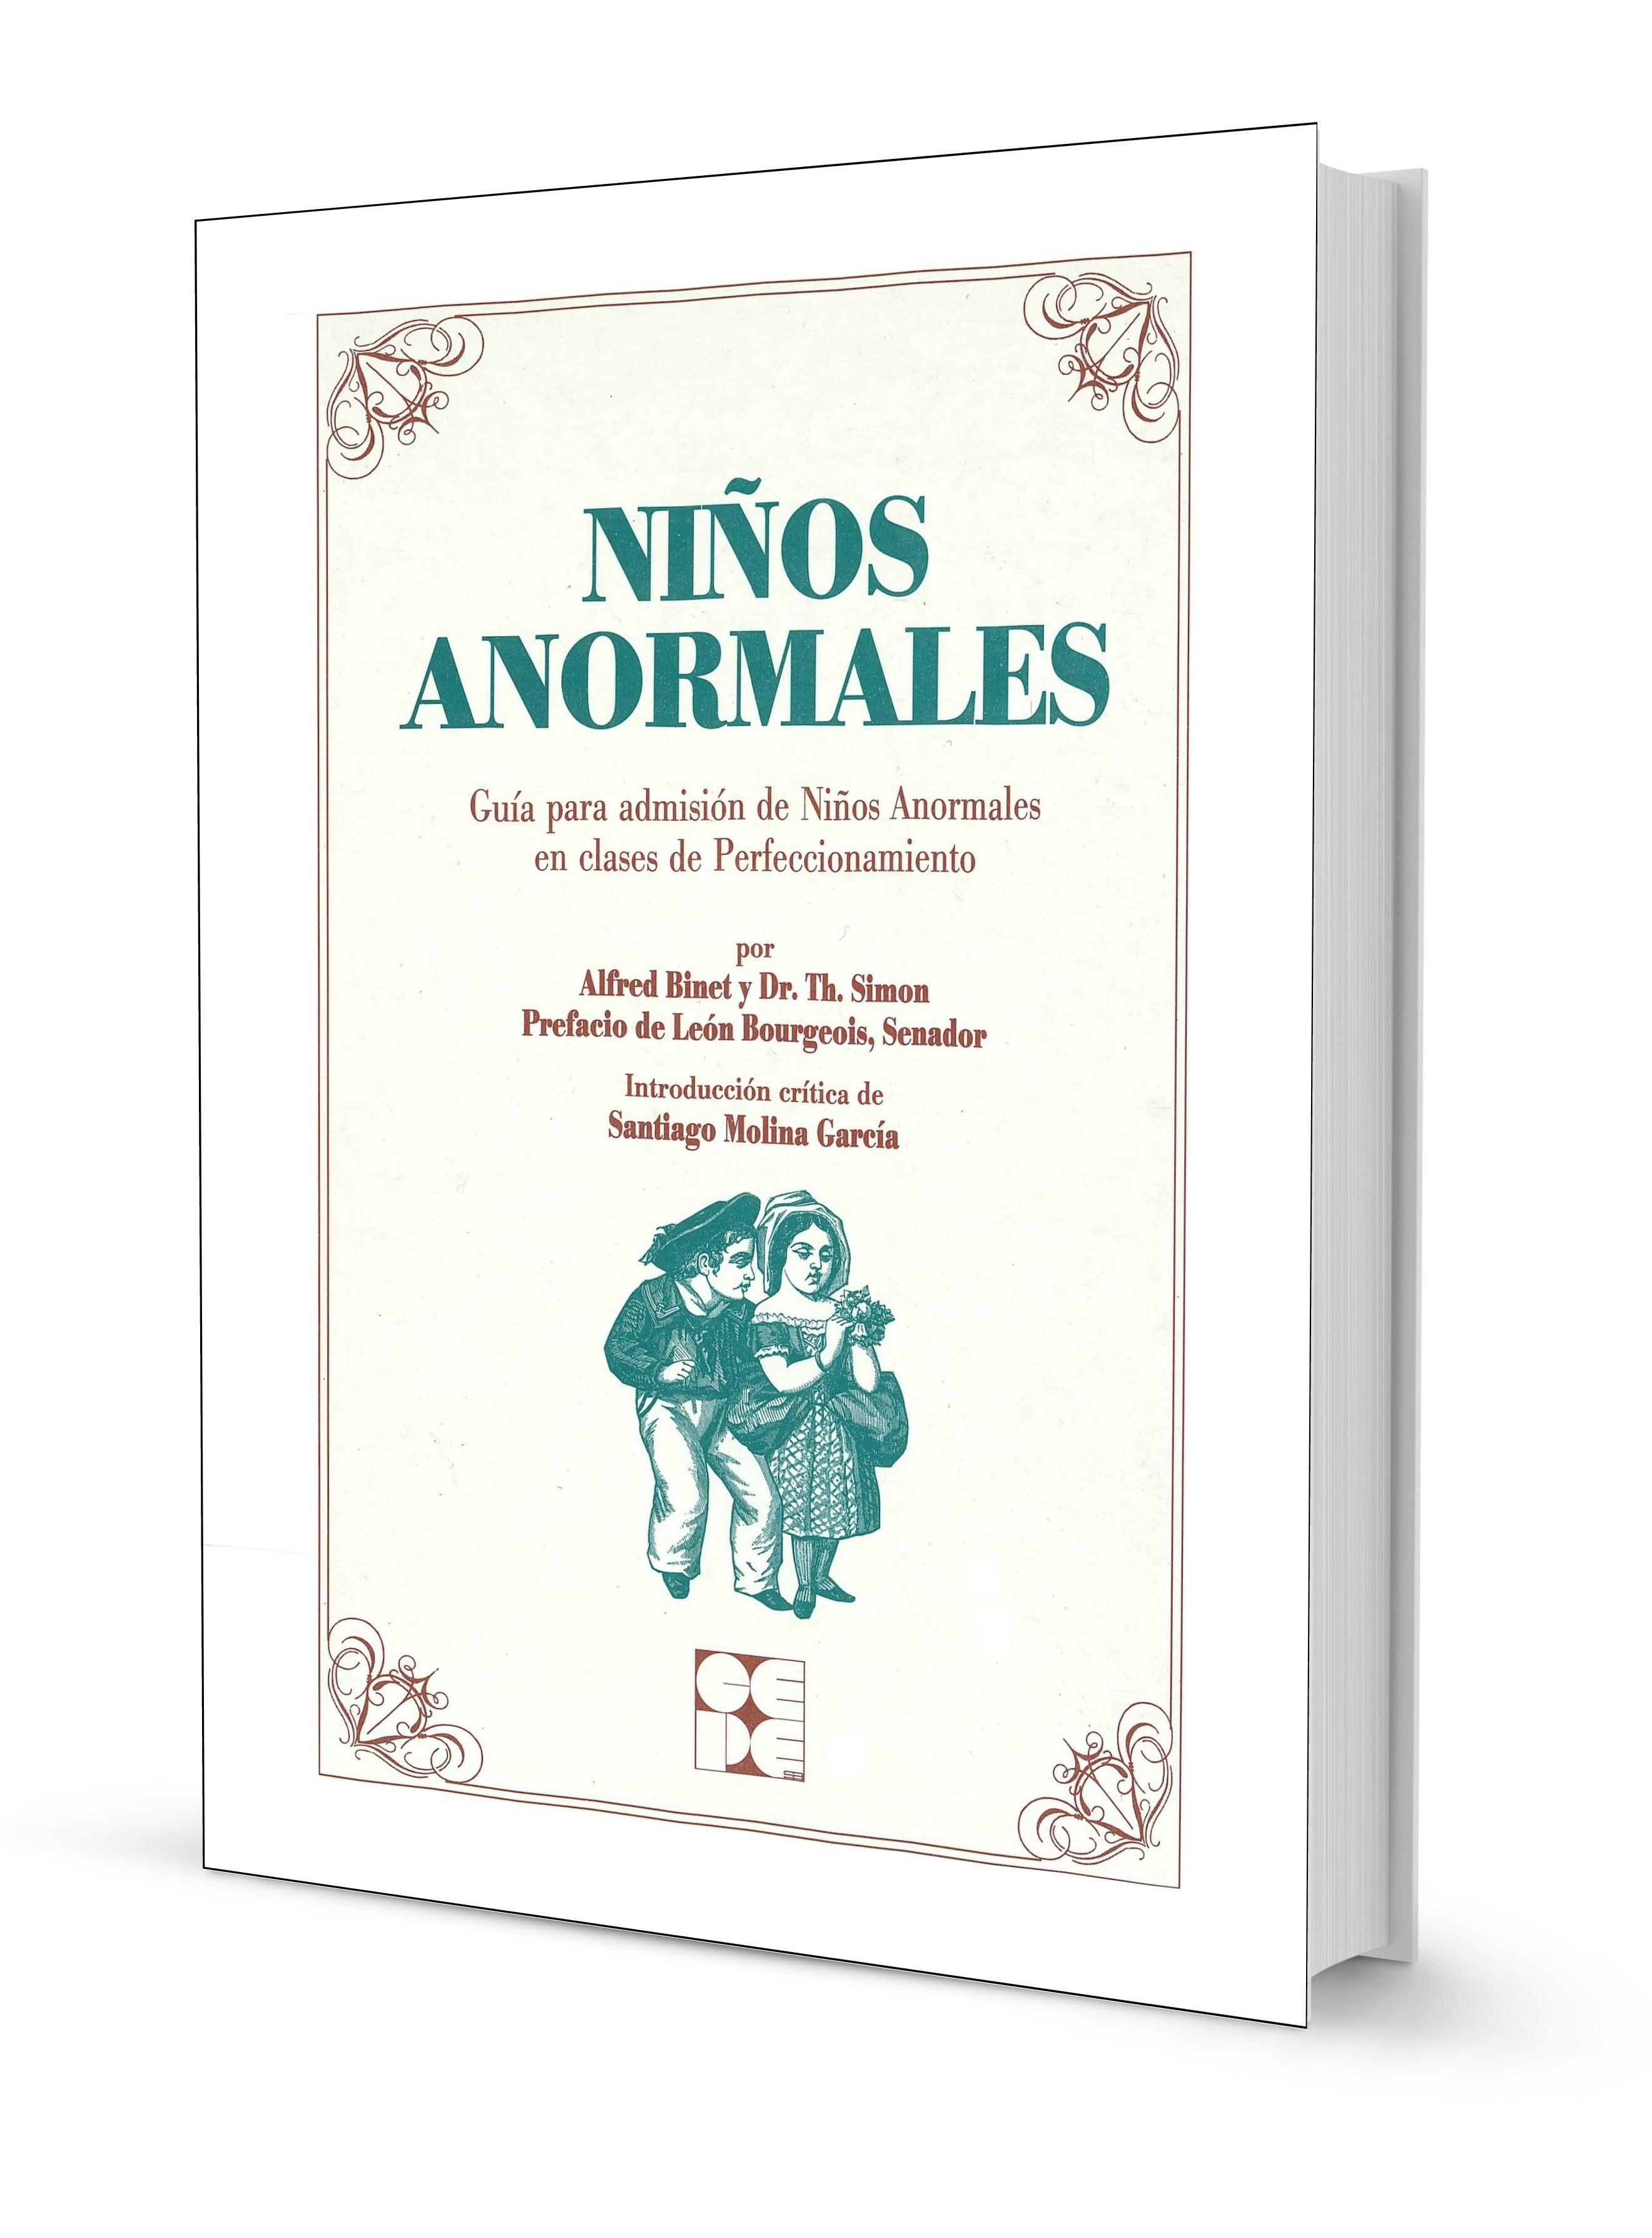 Niños Anormales | Editorial CEPE